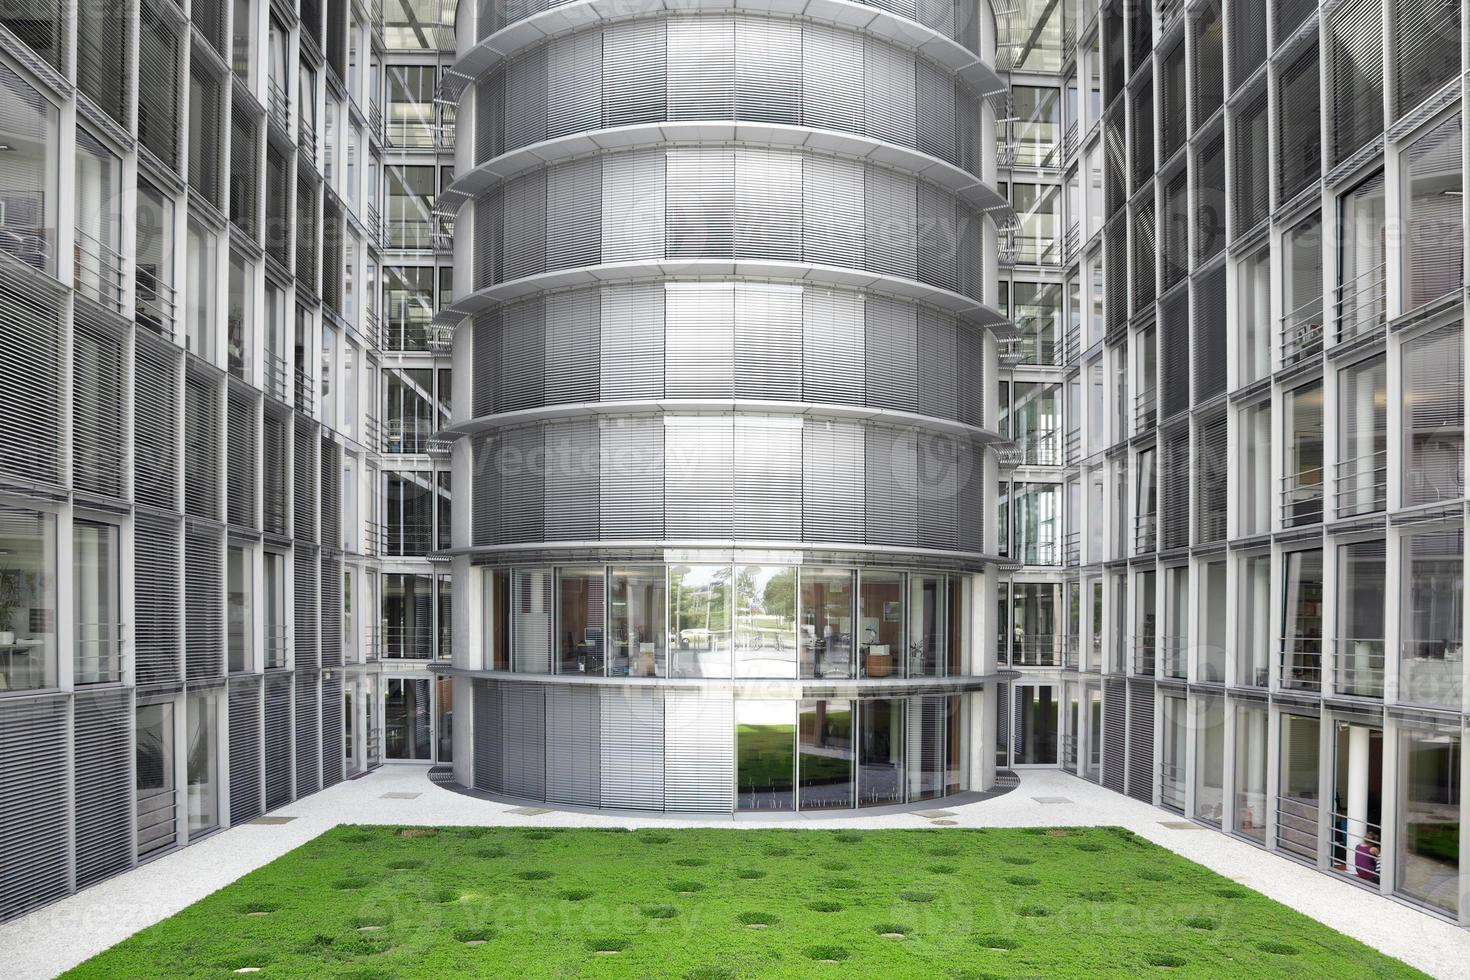 paul loebe haus, berlin, moderne architectuur foto